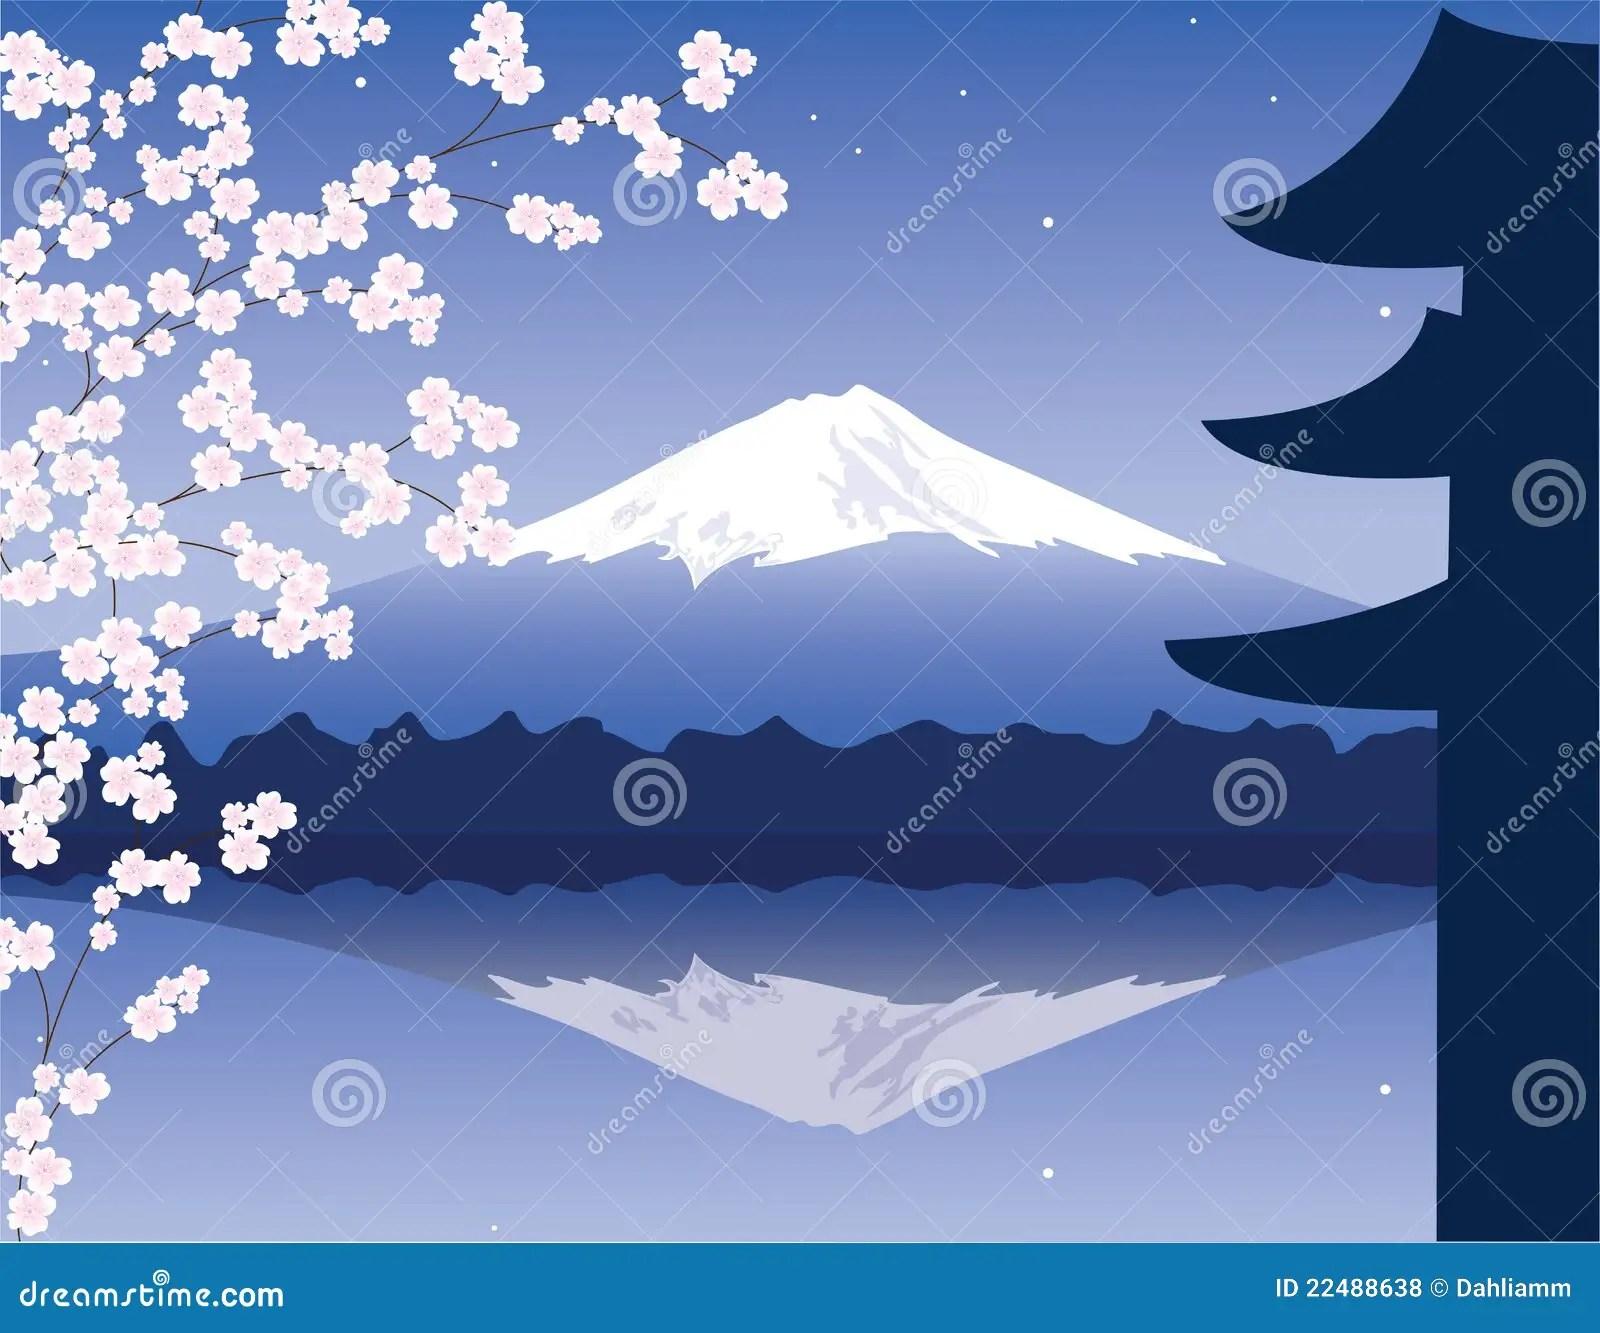 Black And Pink Flower Wallpaper Vector Mount Fuji And Sakura Stock Vector Image 22488638